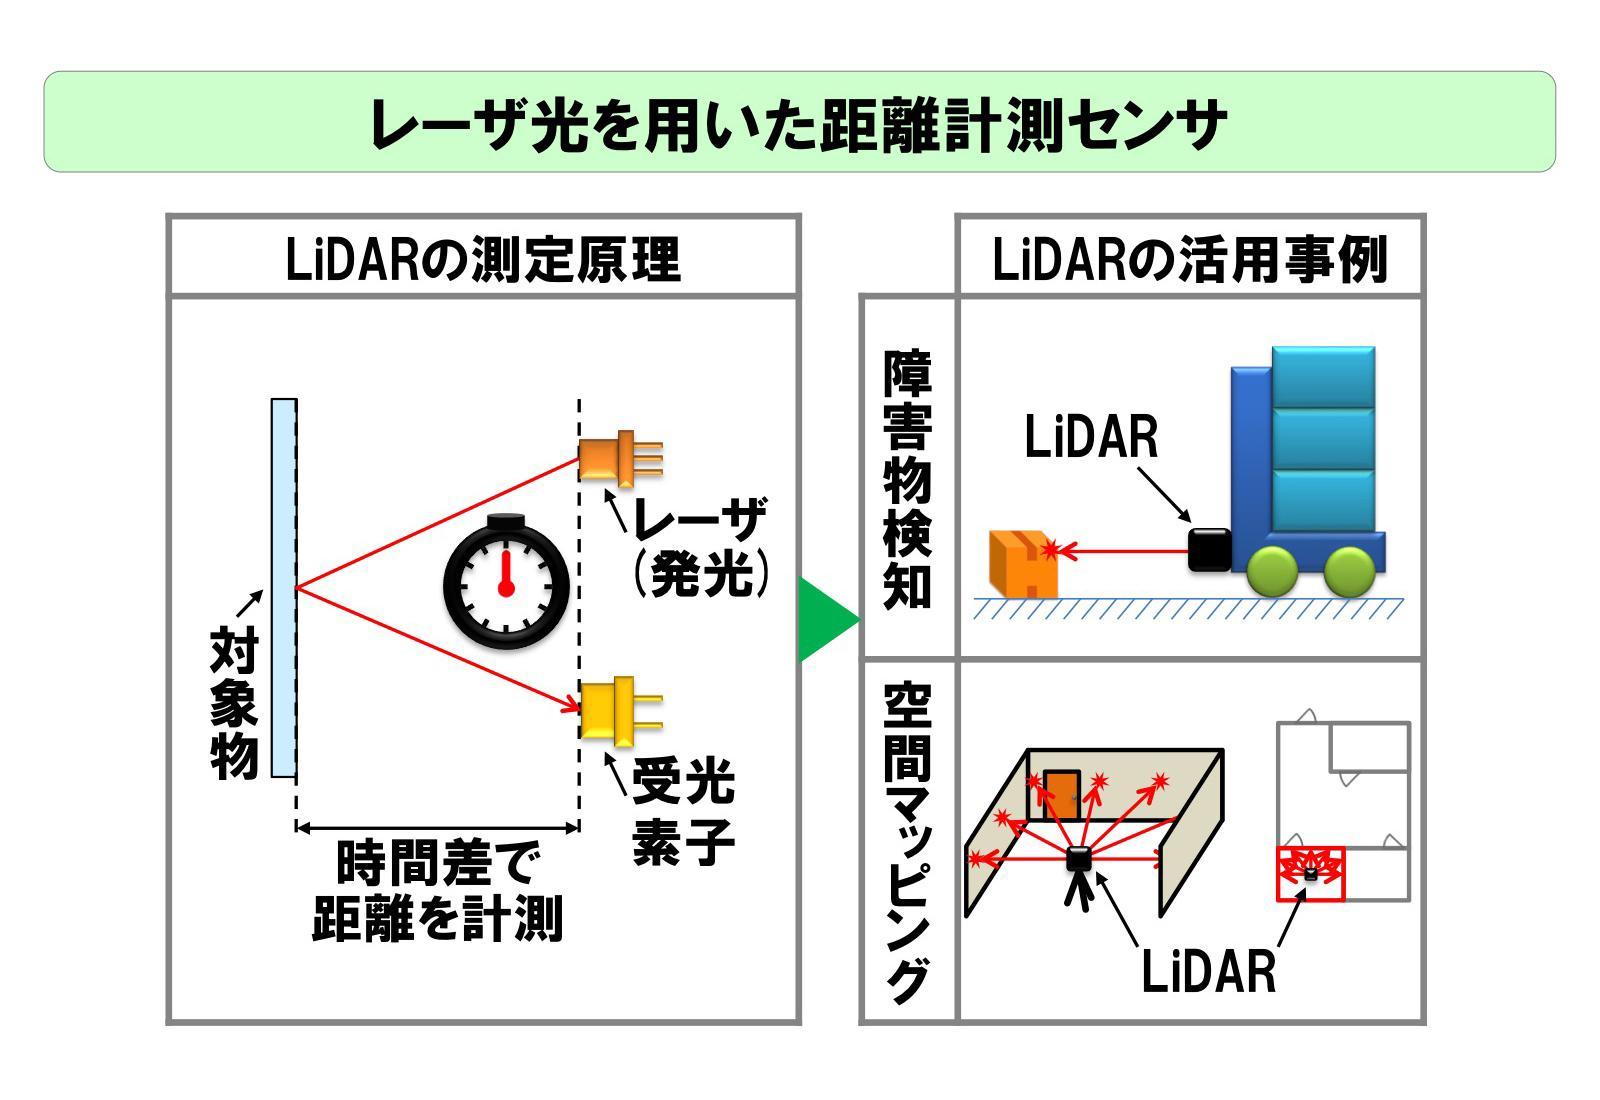 LiDARの測定原理と活用事例